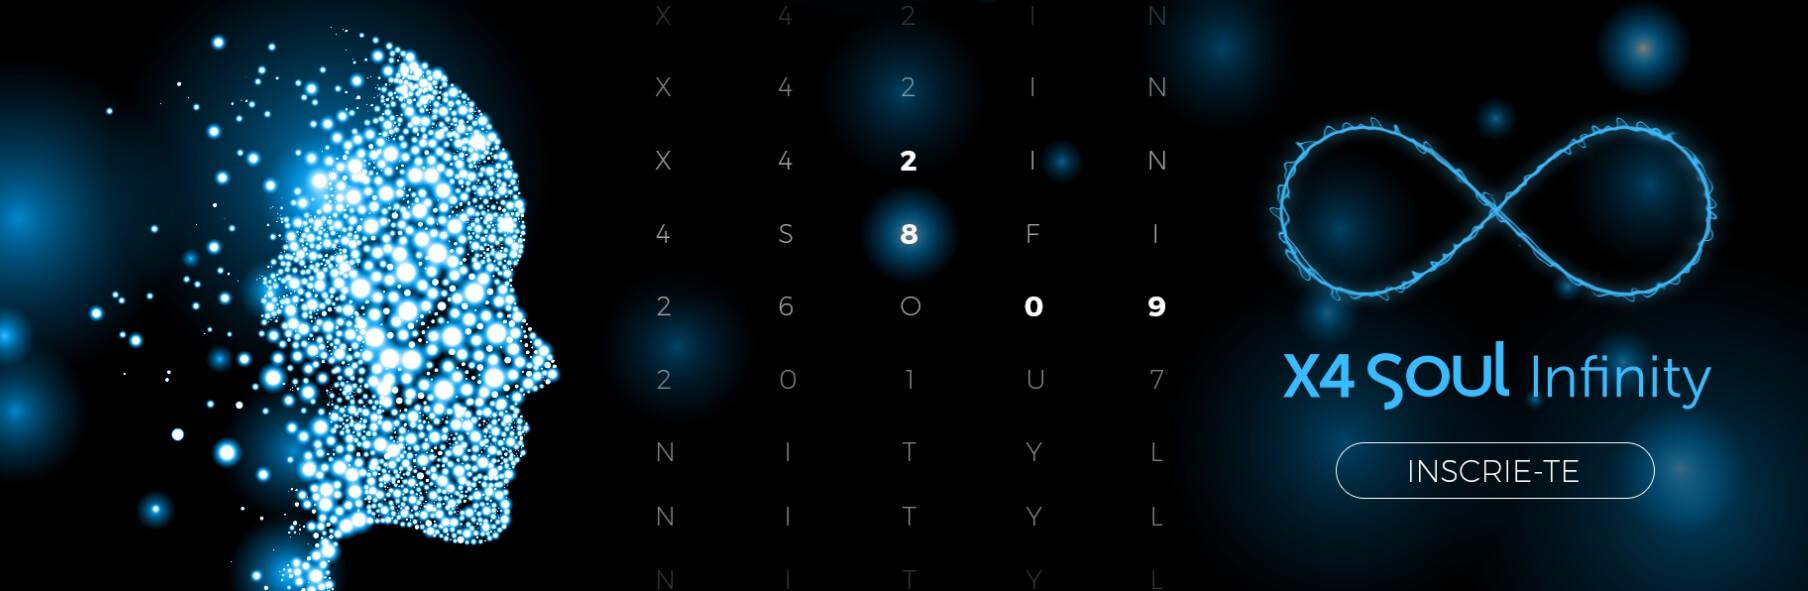 lansare Allview X4 Soul Infinity